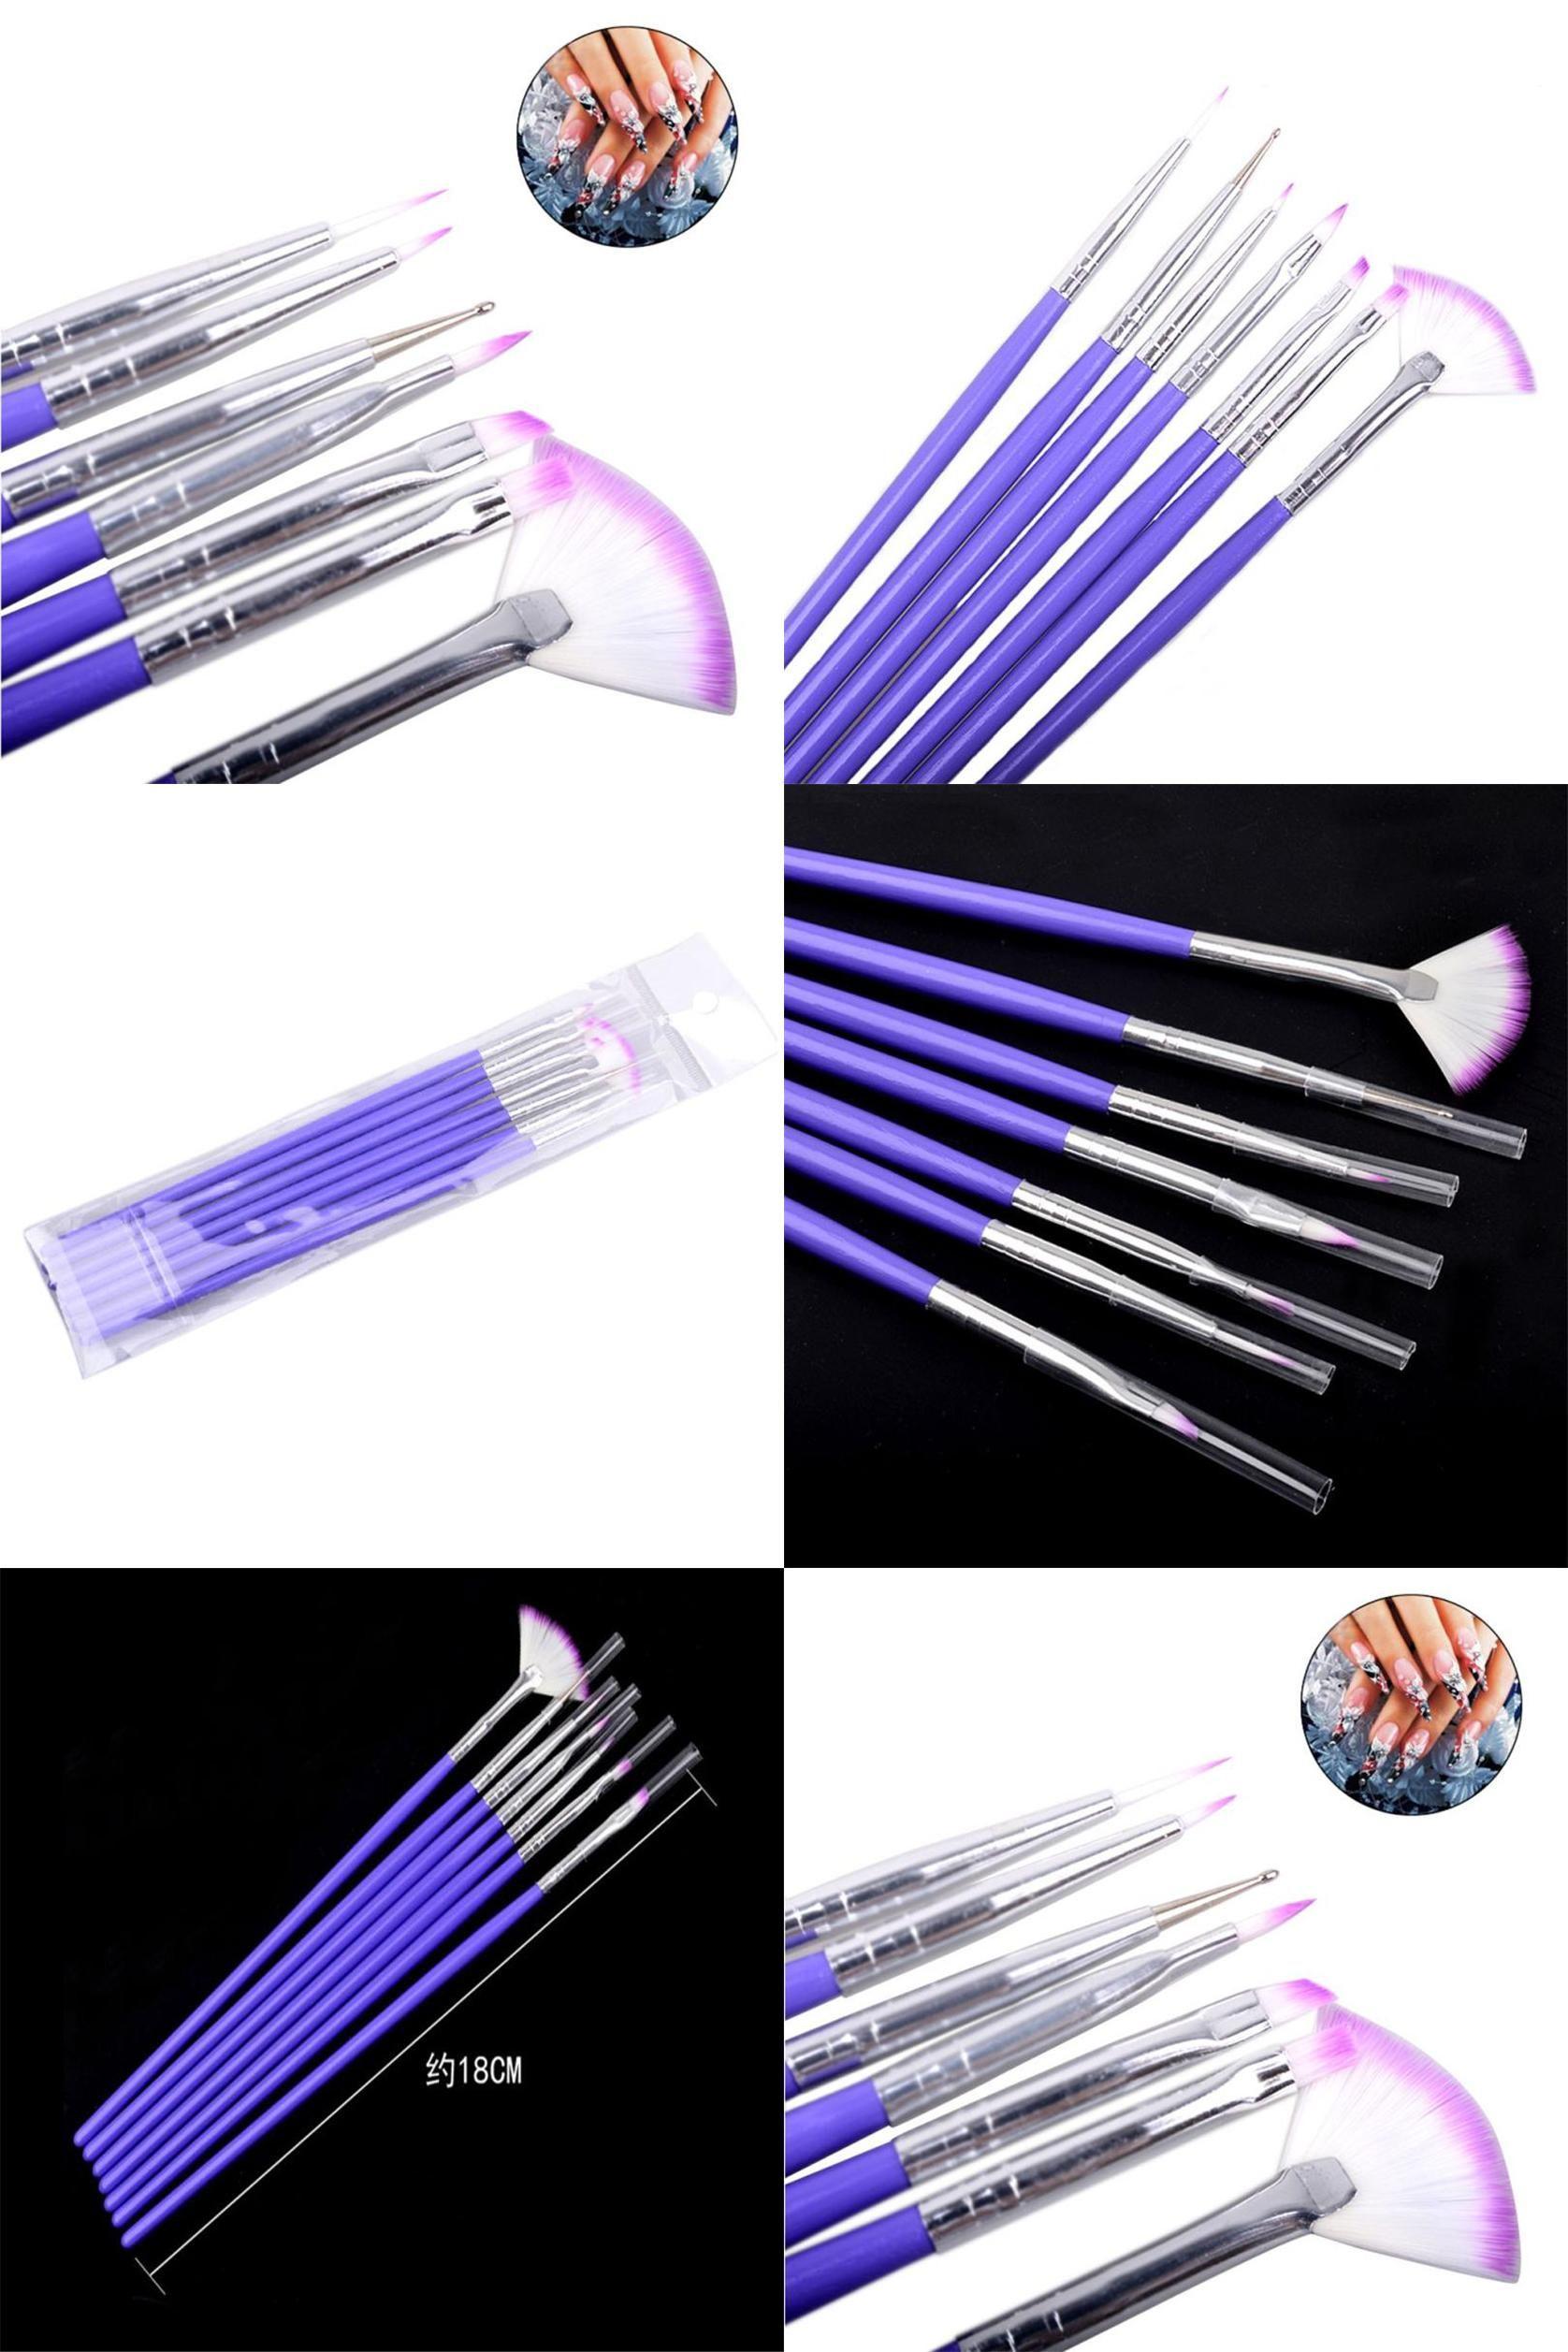 Visit To Buy Nail Brushes 7pcsset Luxury Nail Art Design Brushes